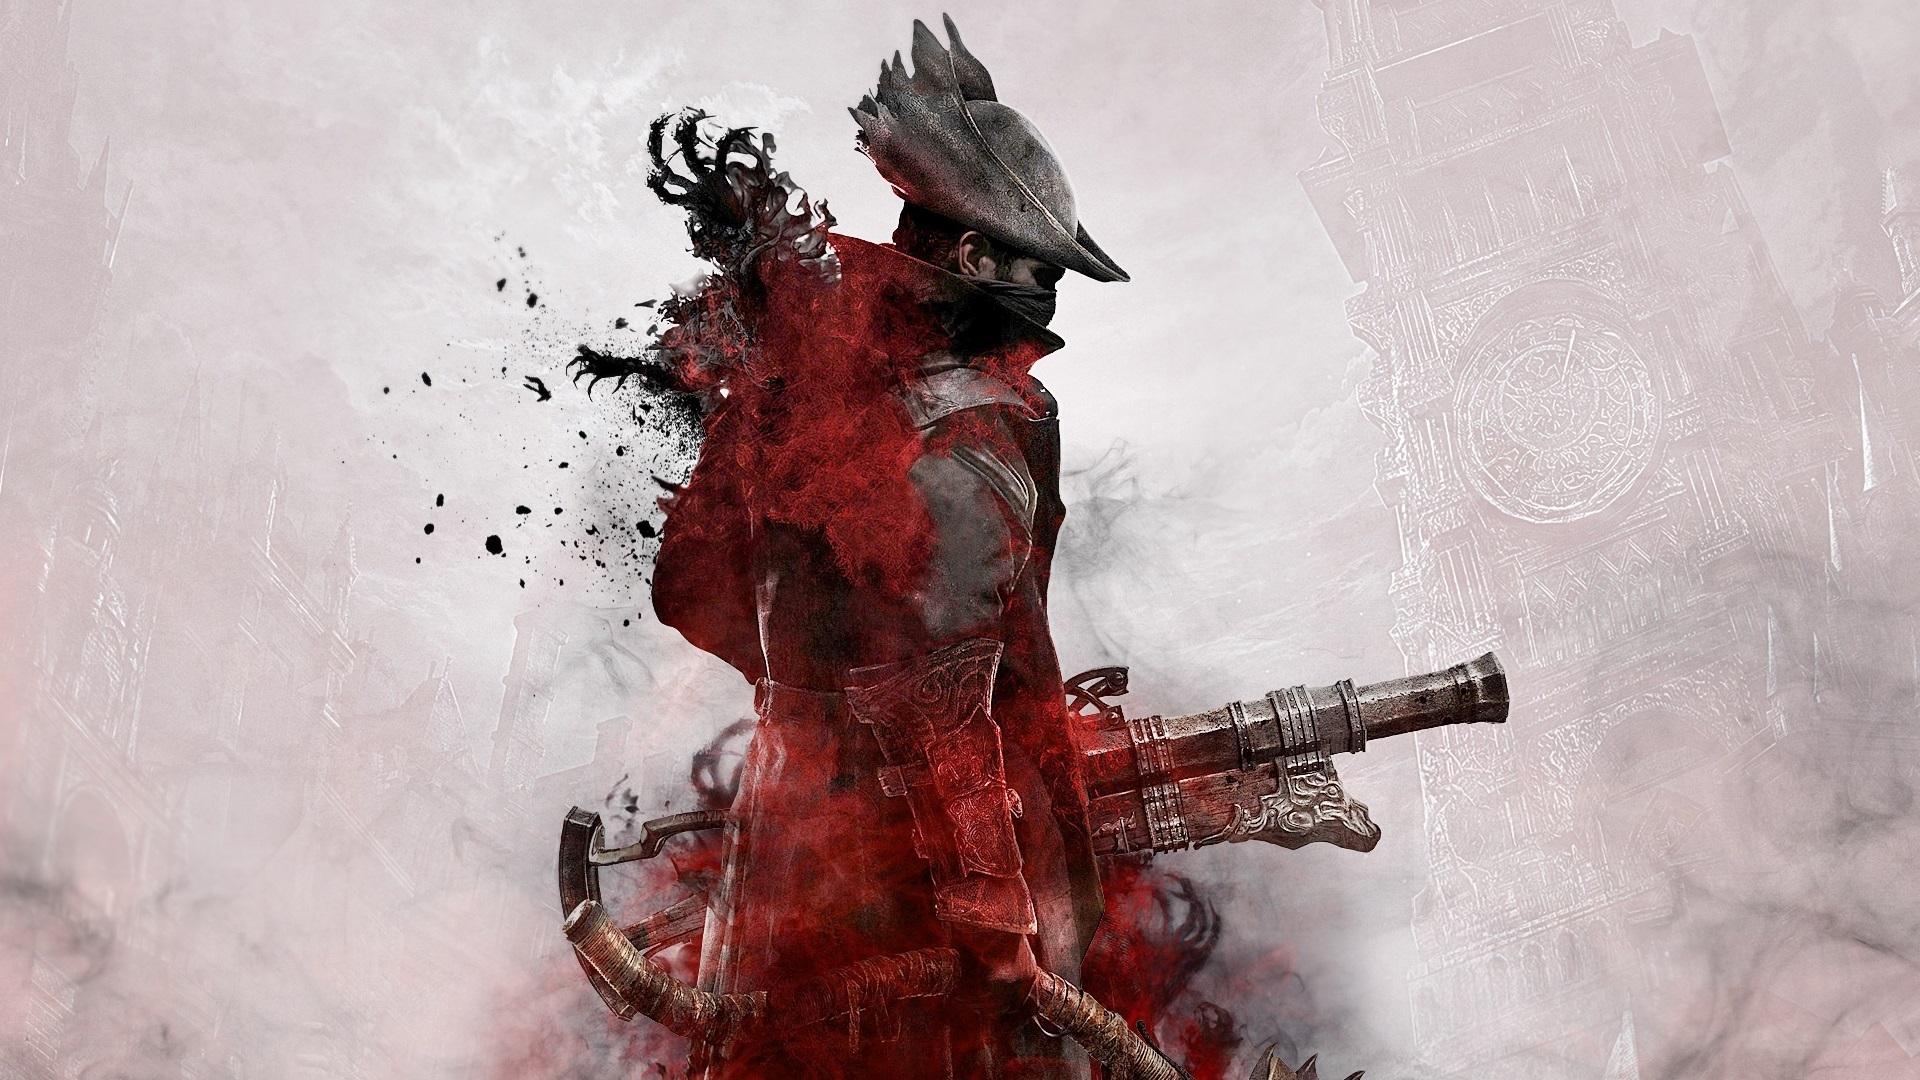 bloodborne-from-software-6298